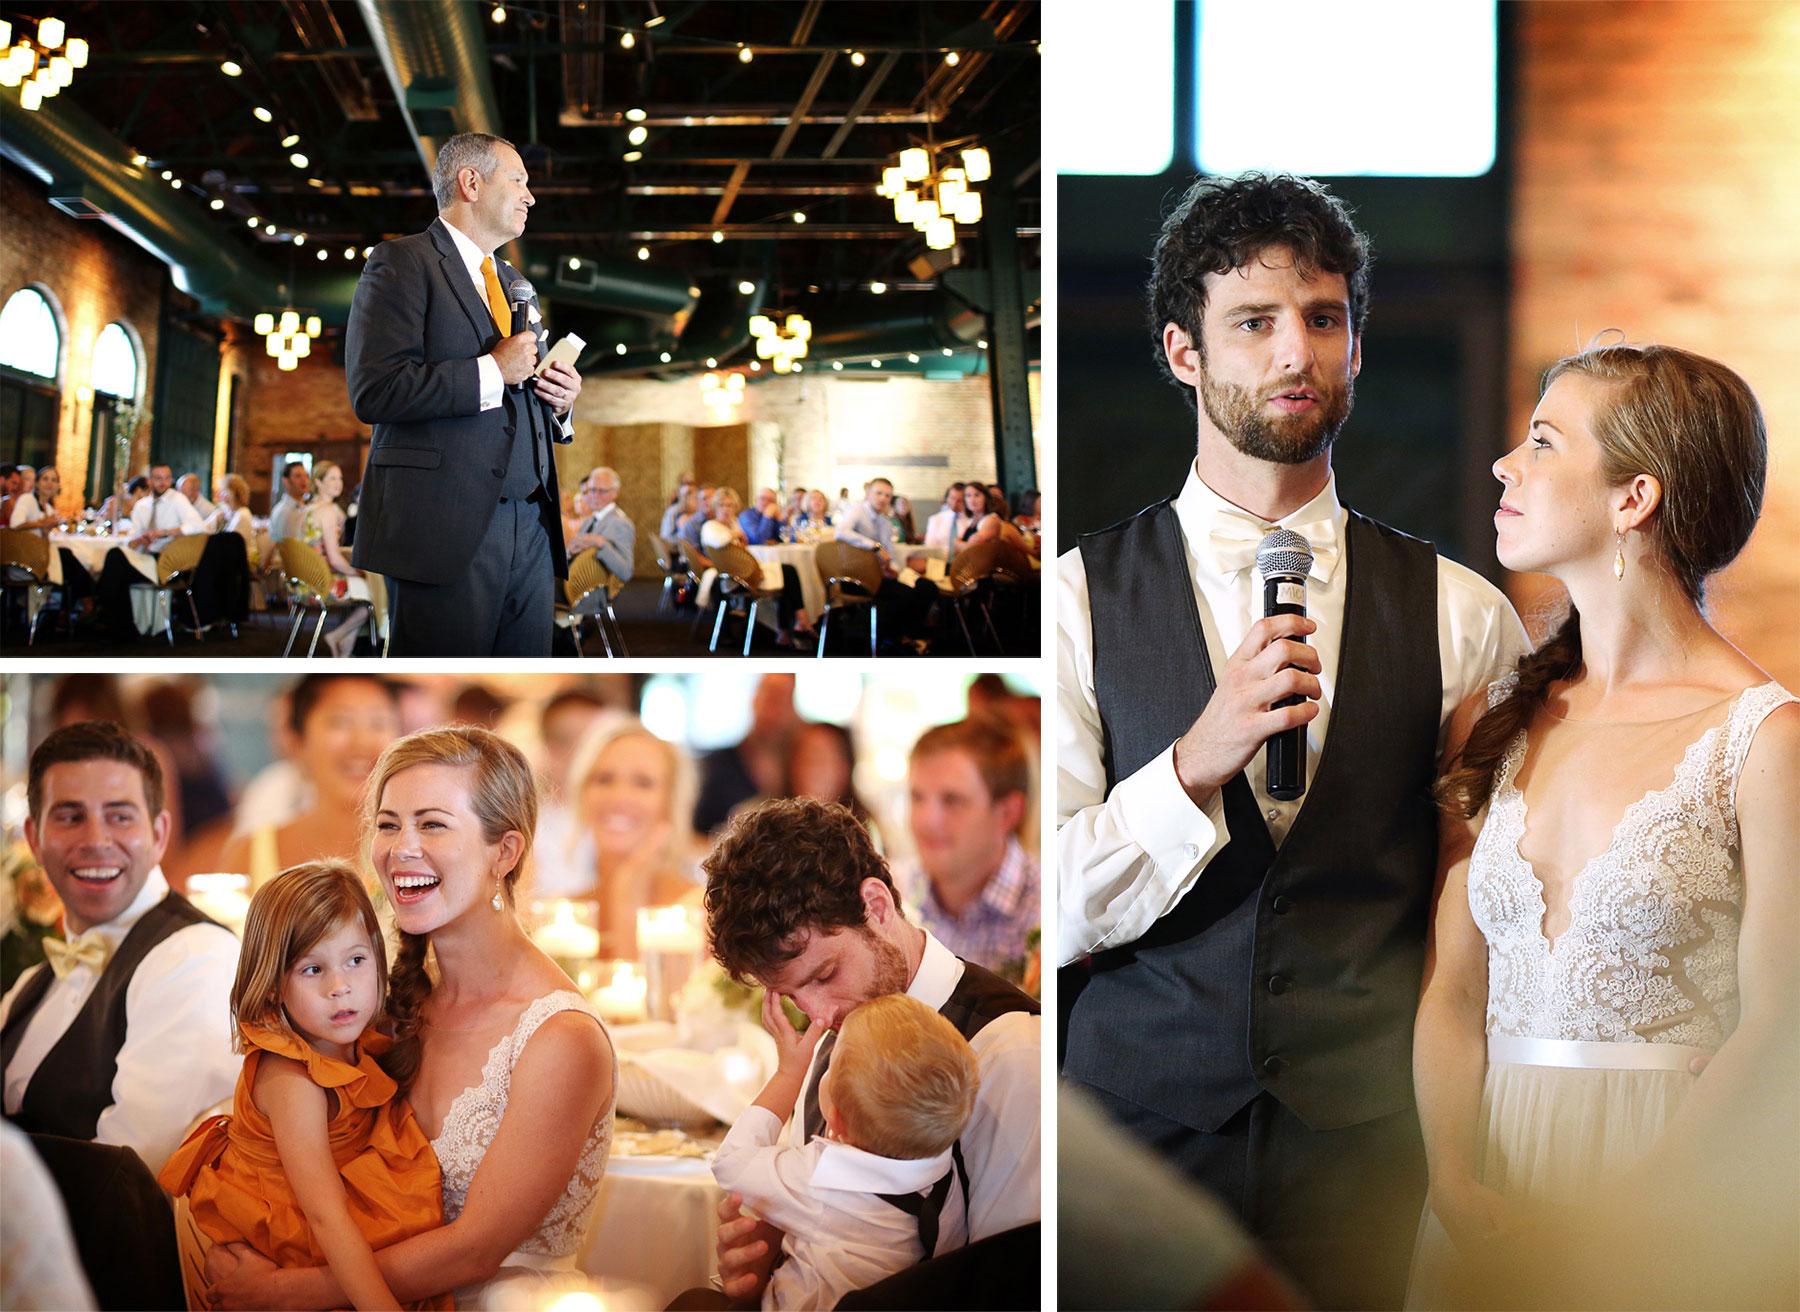 22-Minneapolis-Minnesota-Wedding-Photography-by-Vick-Photography-Downtown-Reception-Nicollet-Island-Pavillion-Sarah-&-Tom.jpg